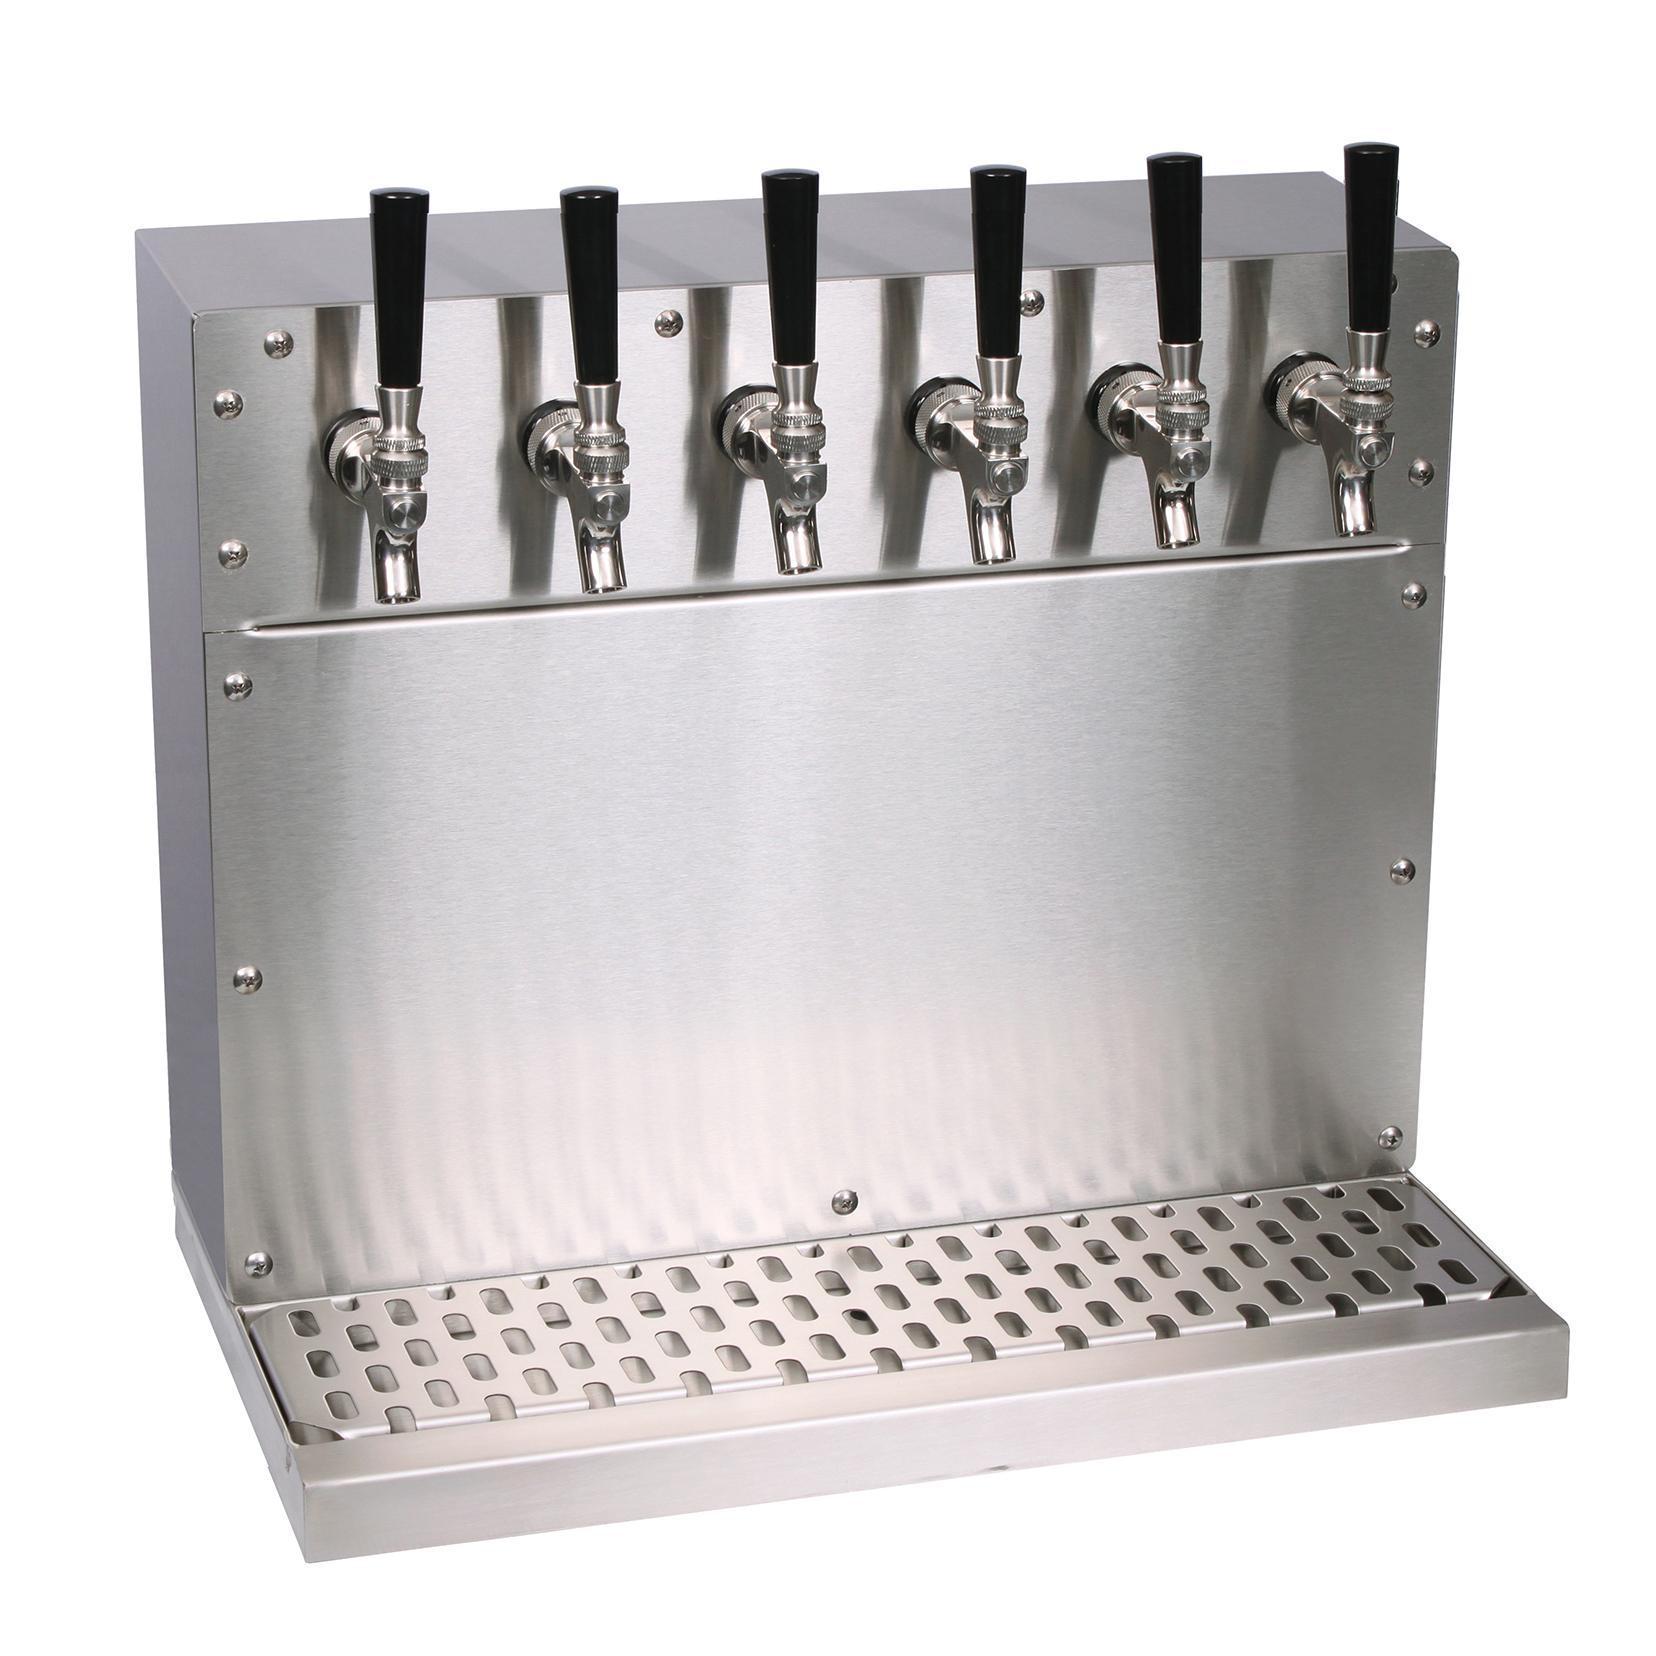 Glastender WT-8-SS draft beer / wine dispensing tower